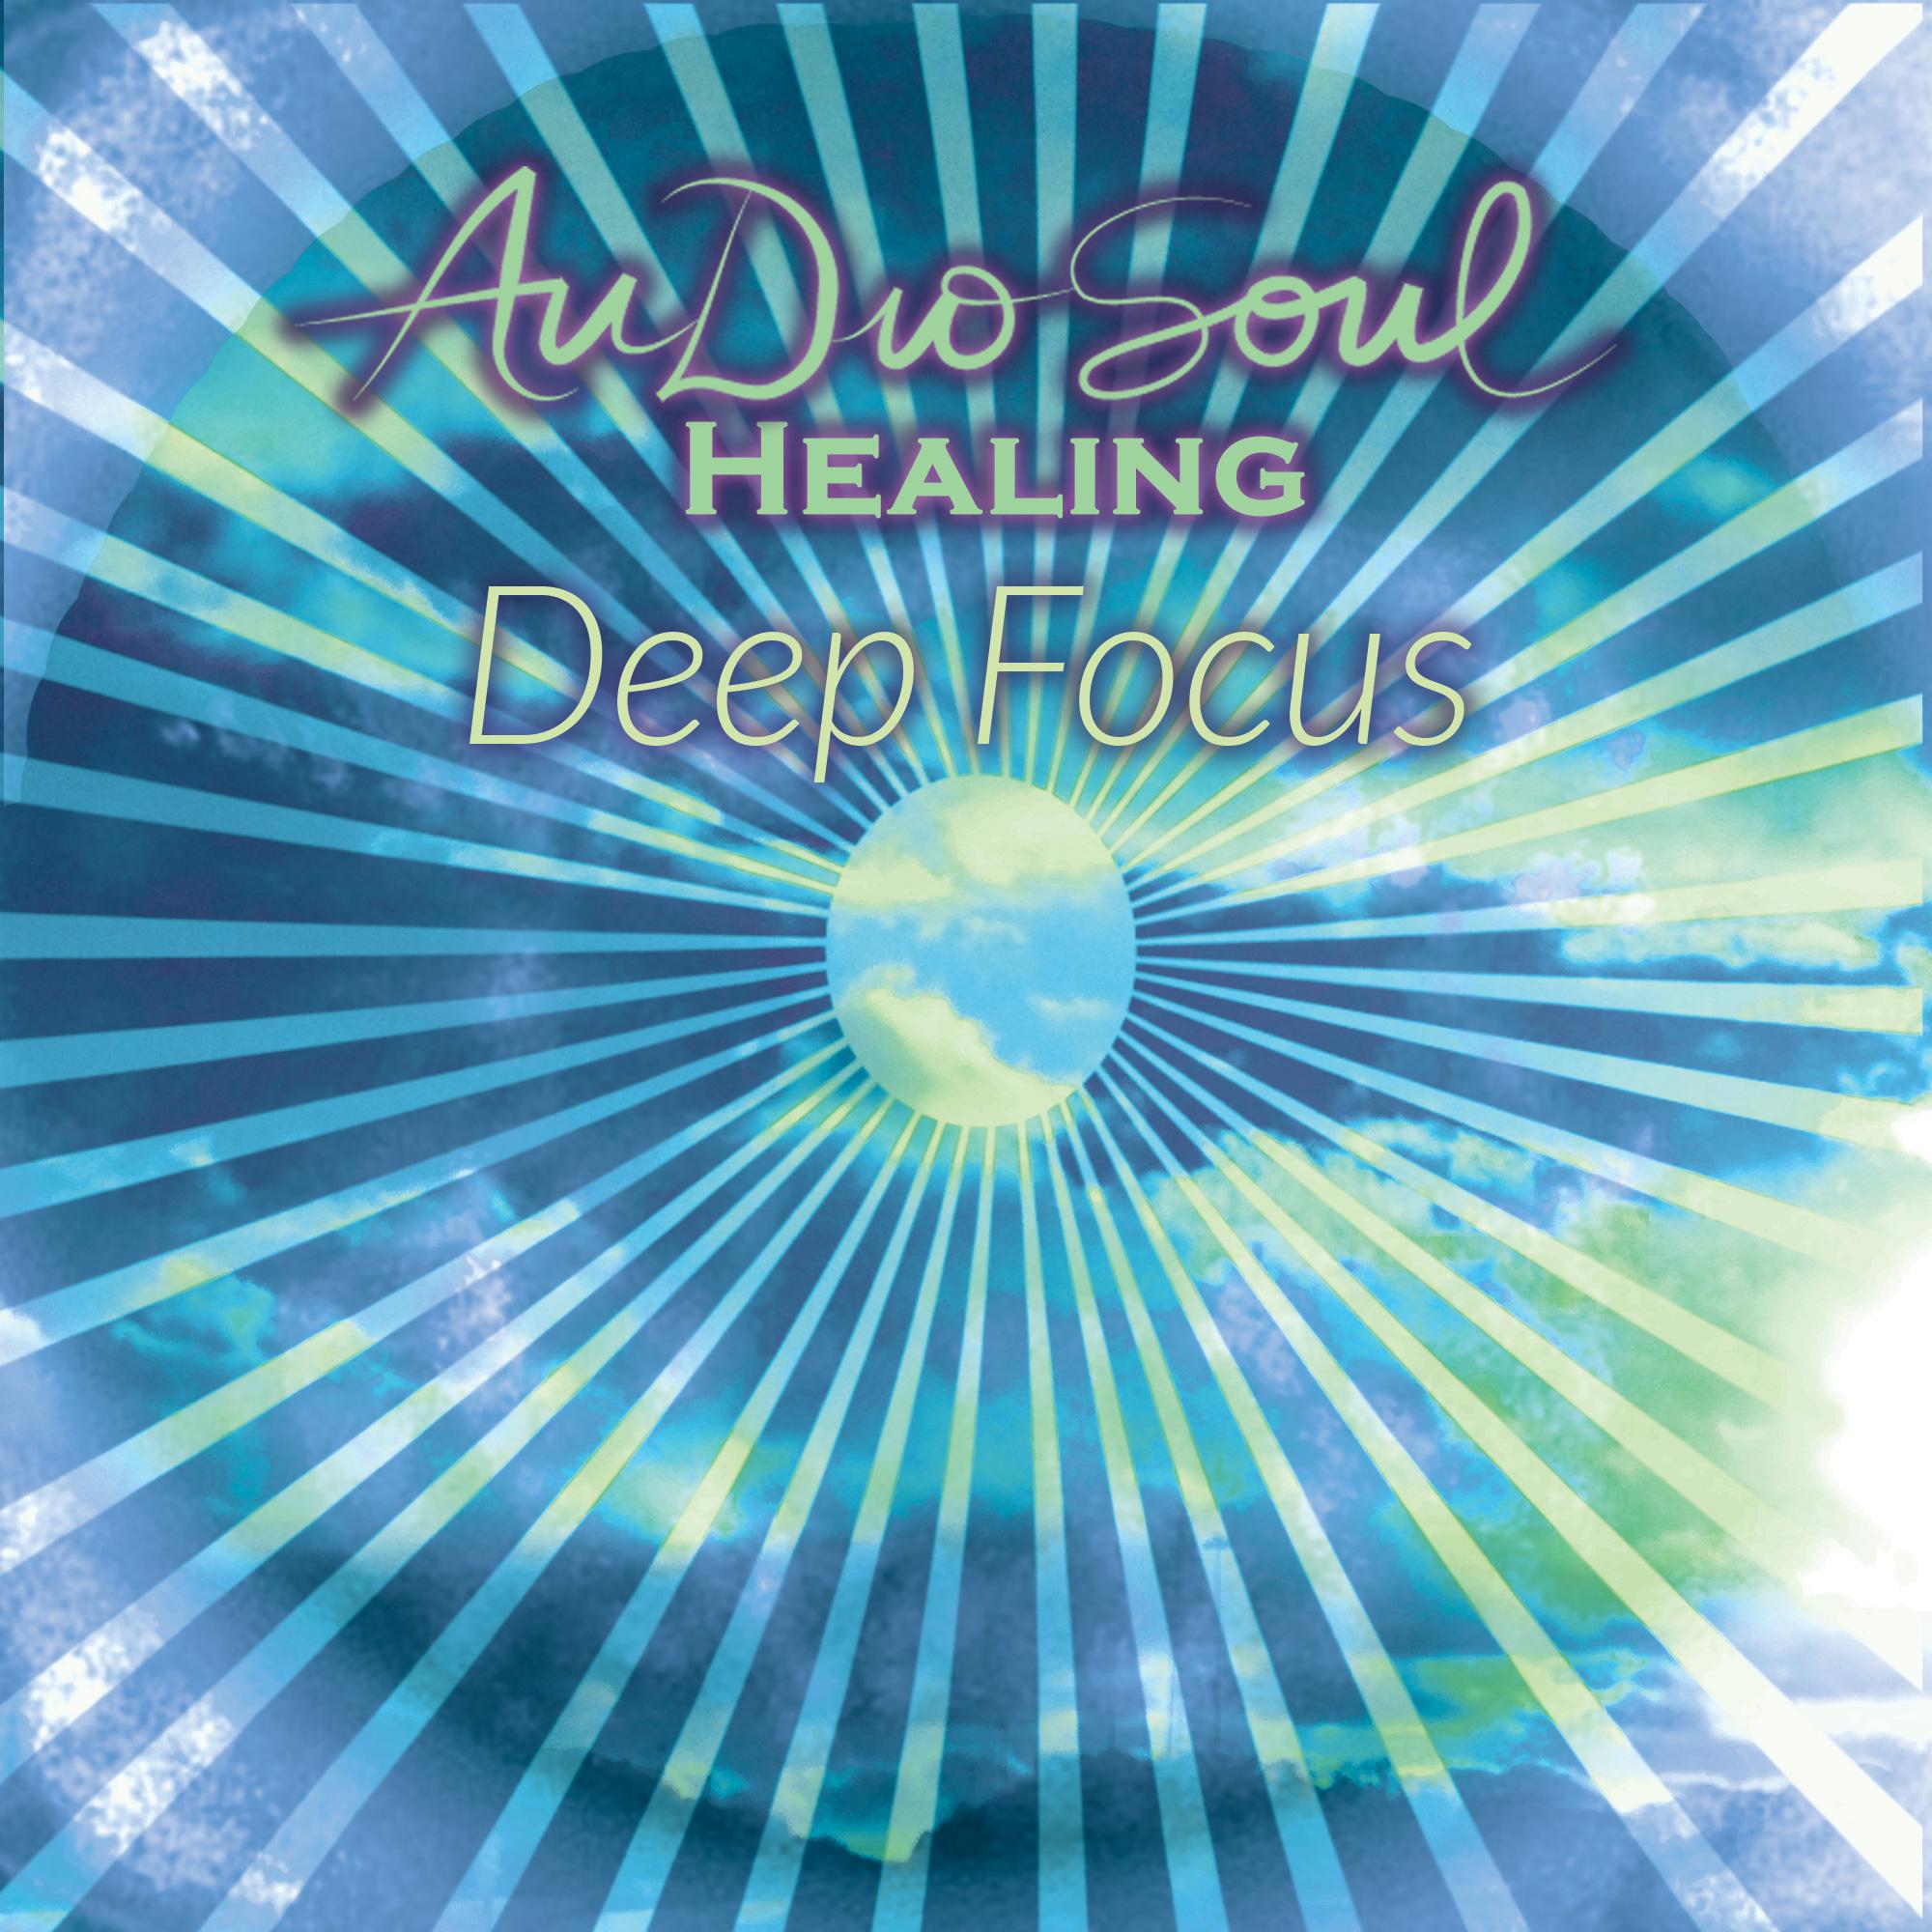 AudioSoul Healing